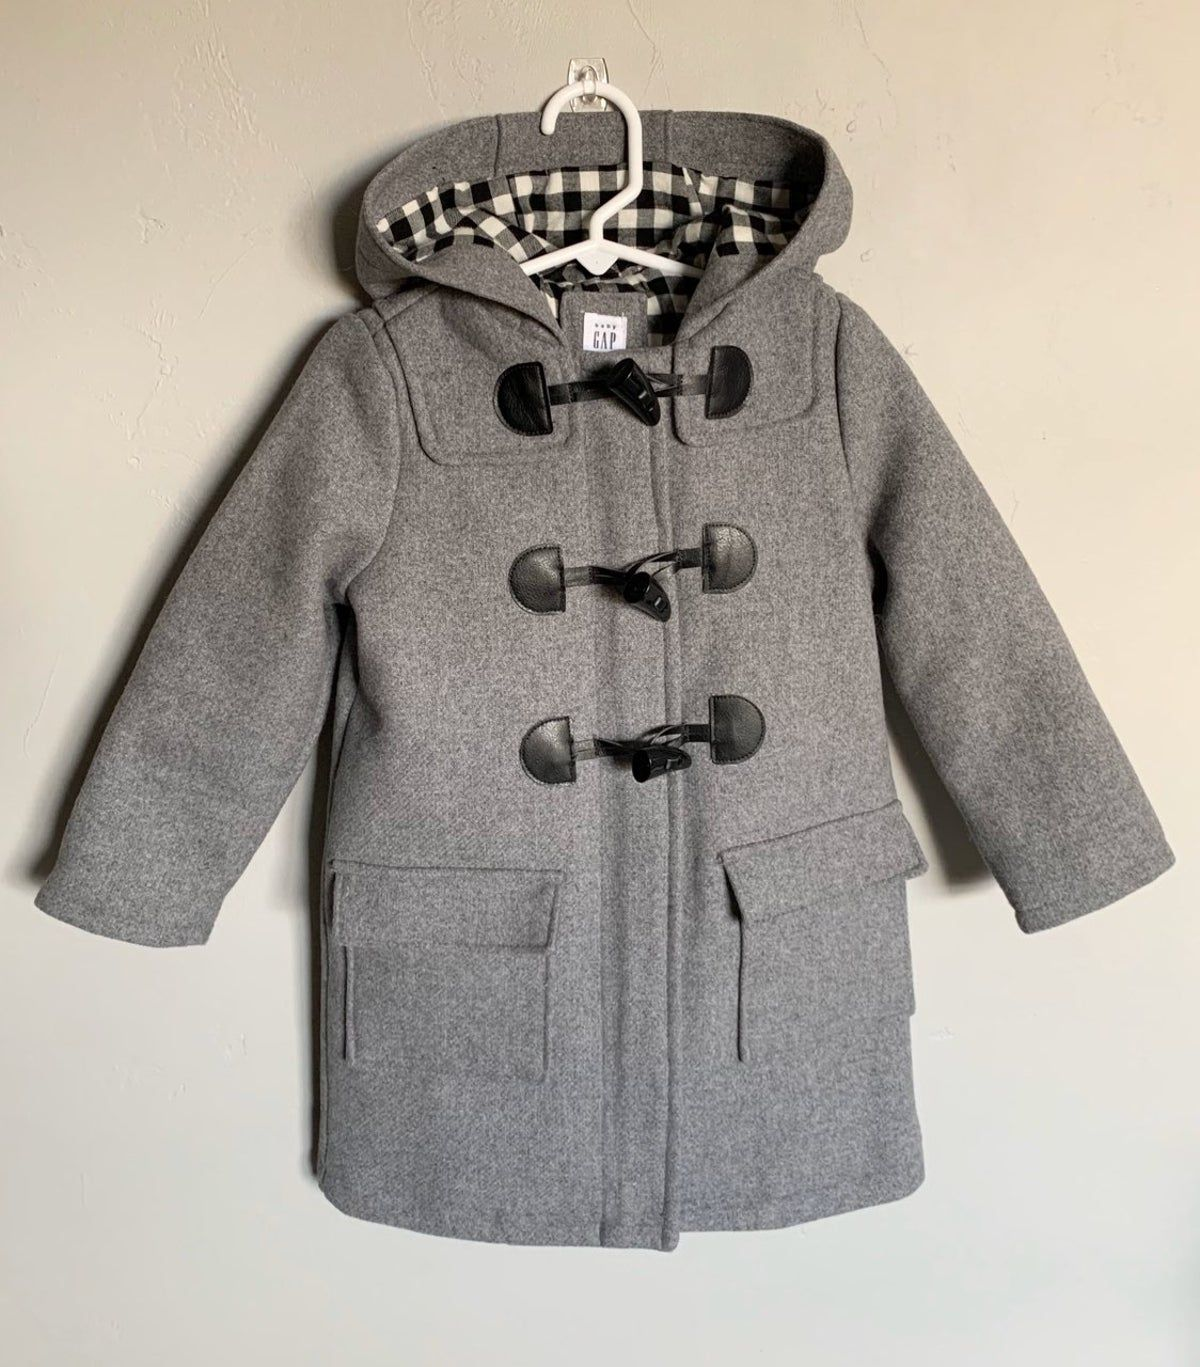 Gap Toddler Girls 4t Coat Coat Wool Dress Coats Toddler Girl [ 1367 x 1200 Pixel ]